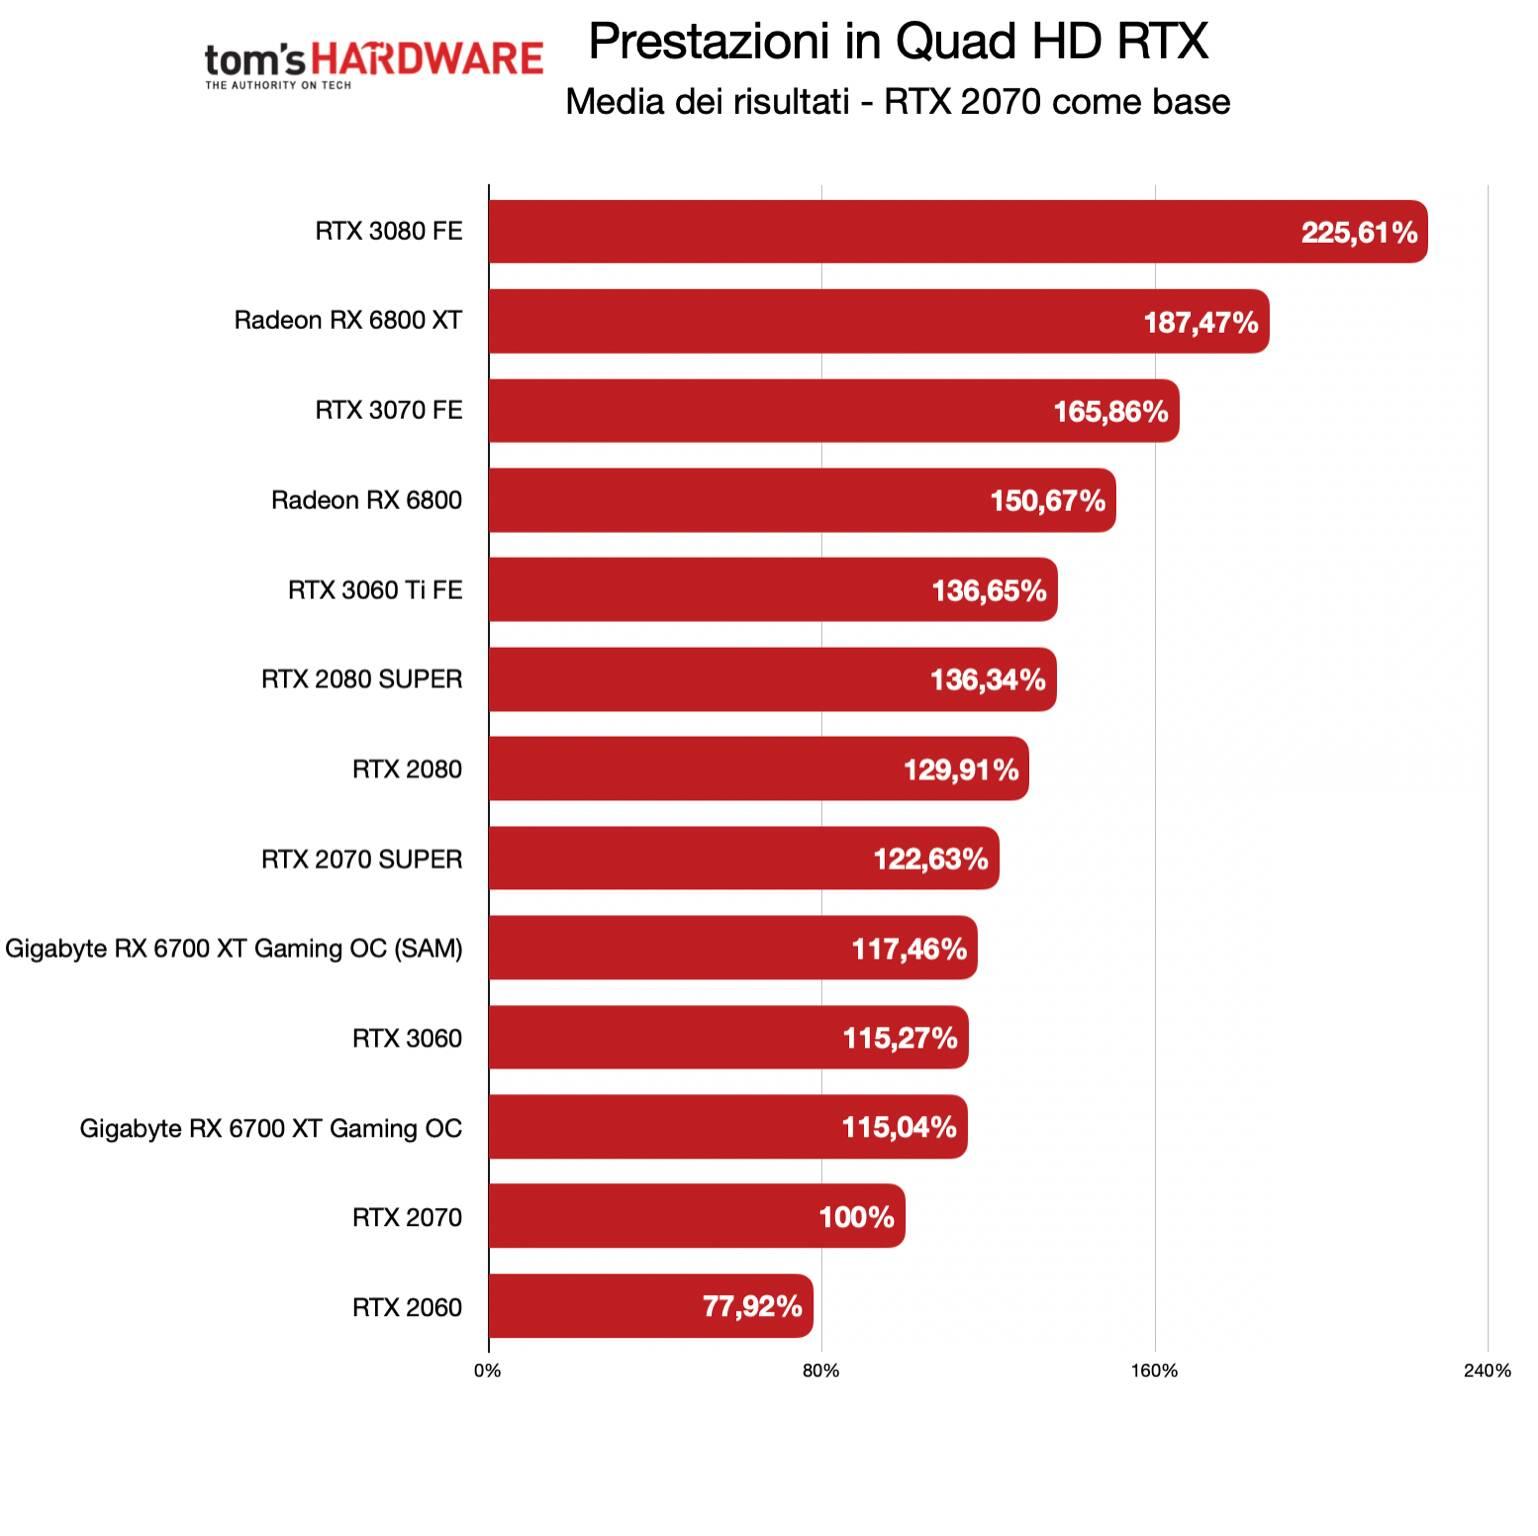 Benchmark Gigabyte RX 6700 XT Gaming OC - QHD RTX - Diff. % RTX 2070